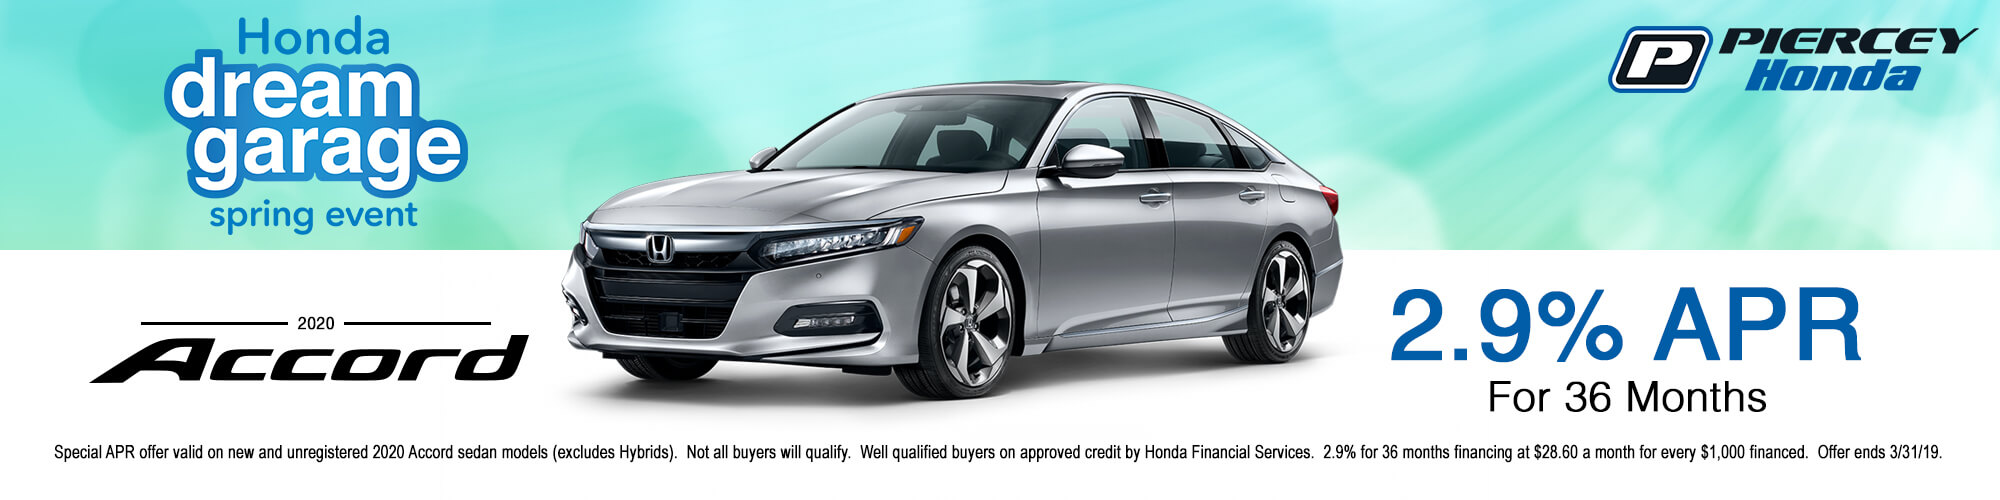 2020 Honda Accord APR Offer